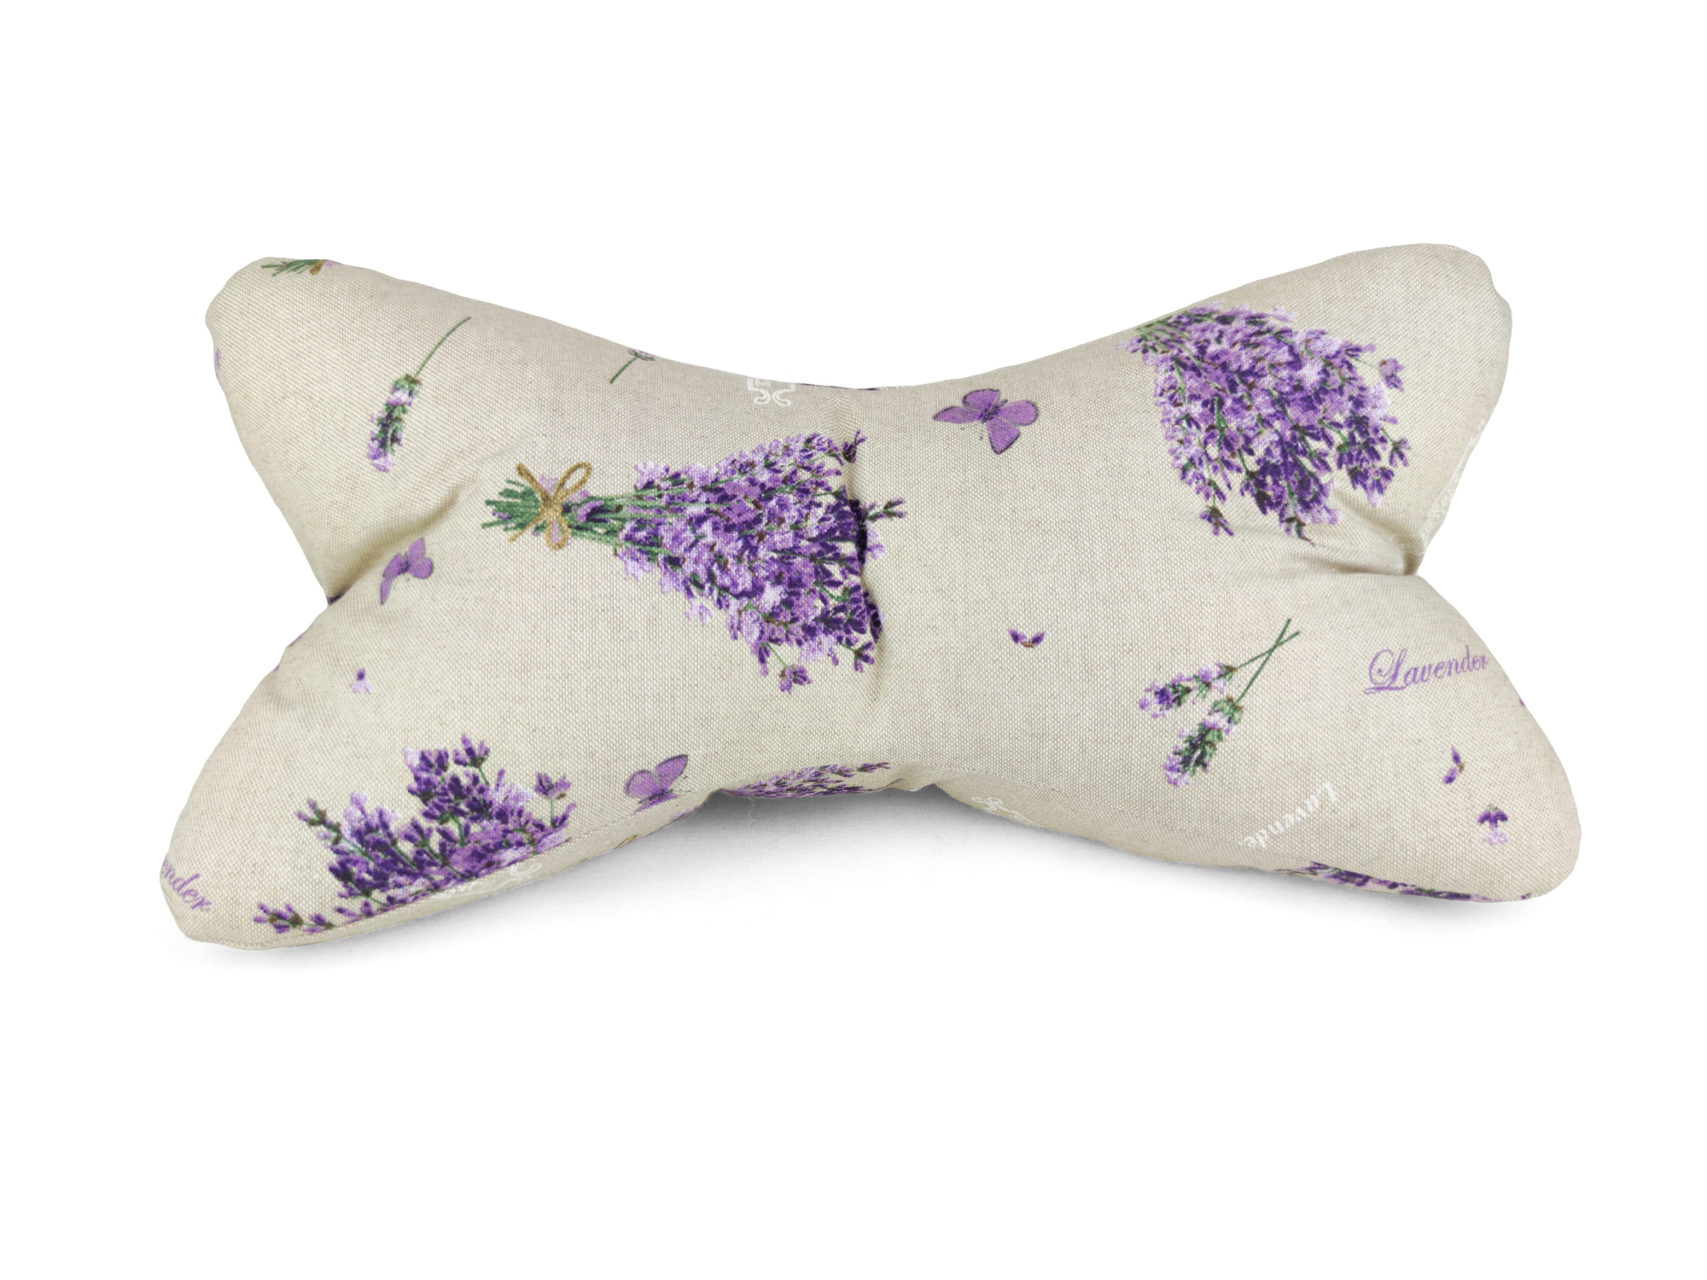 Leseknochen Leinen Look violette Lavendelsträuße